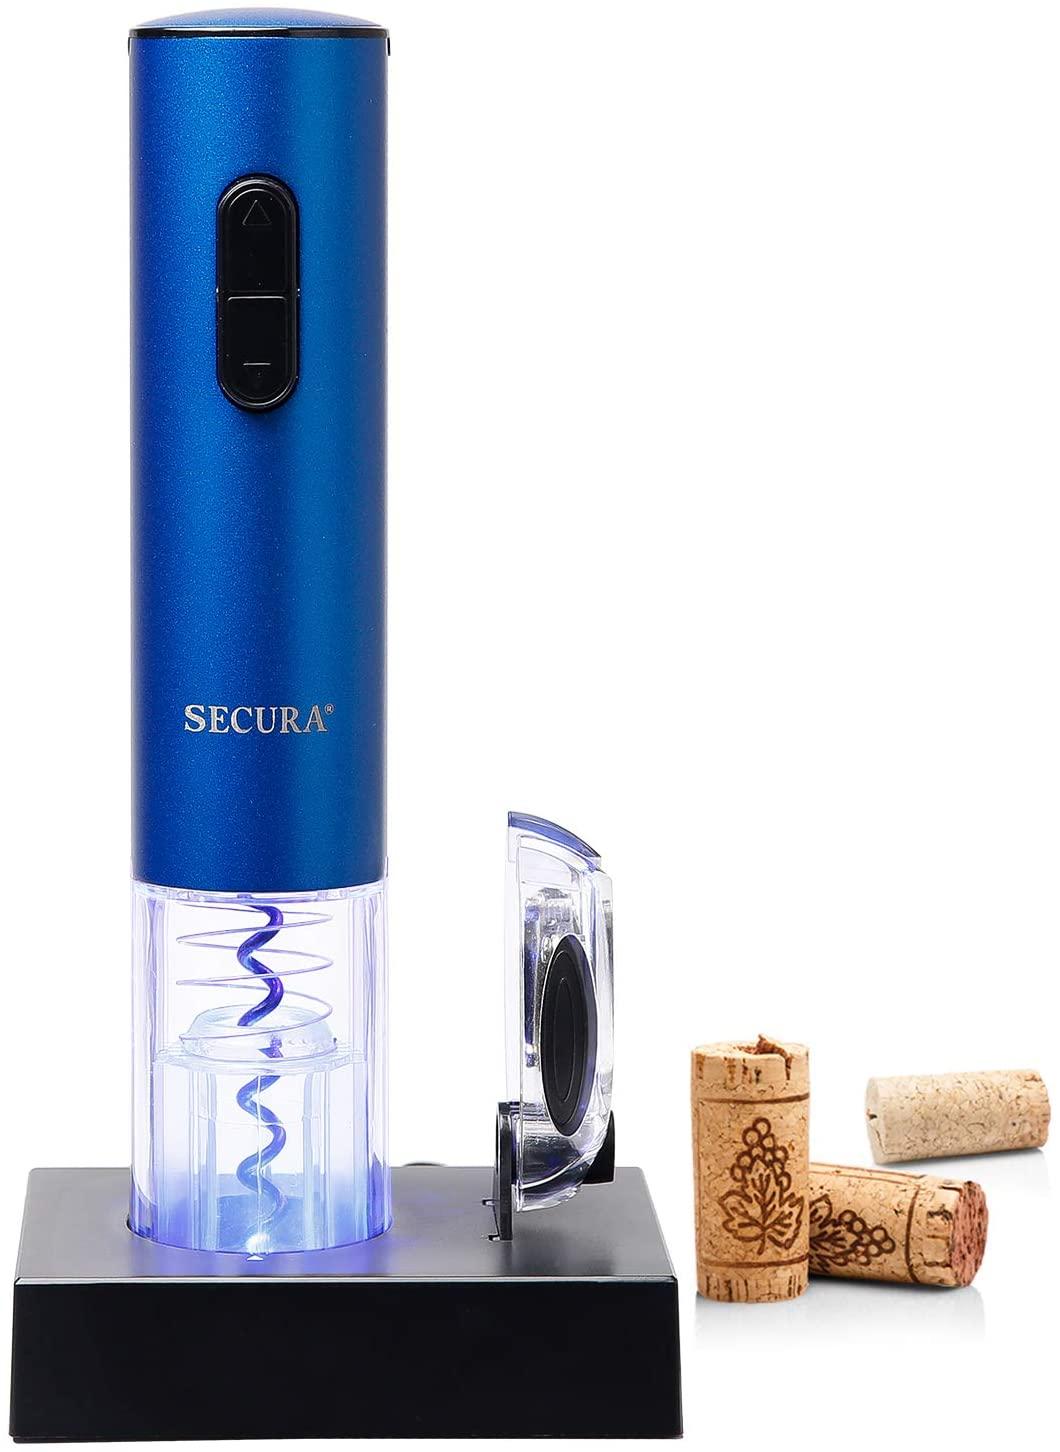 6. Electric Wine Bottle Corkscrew Opener